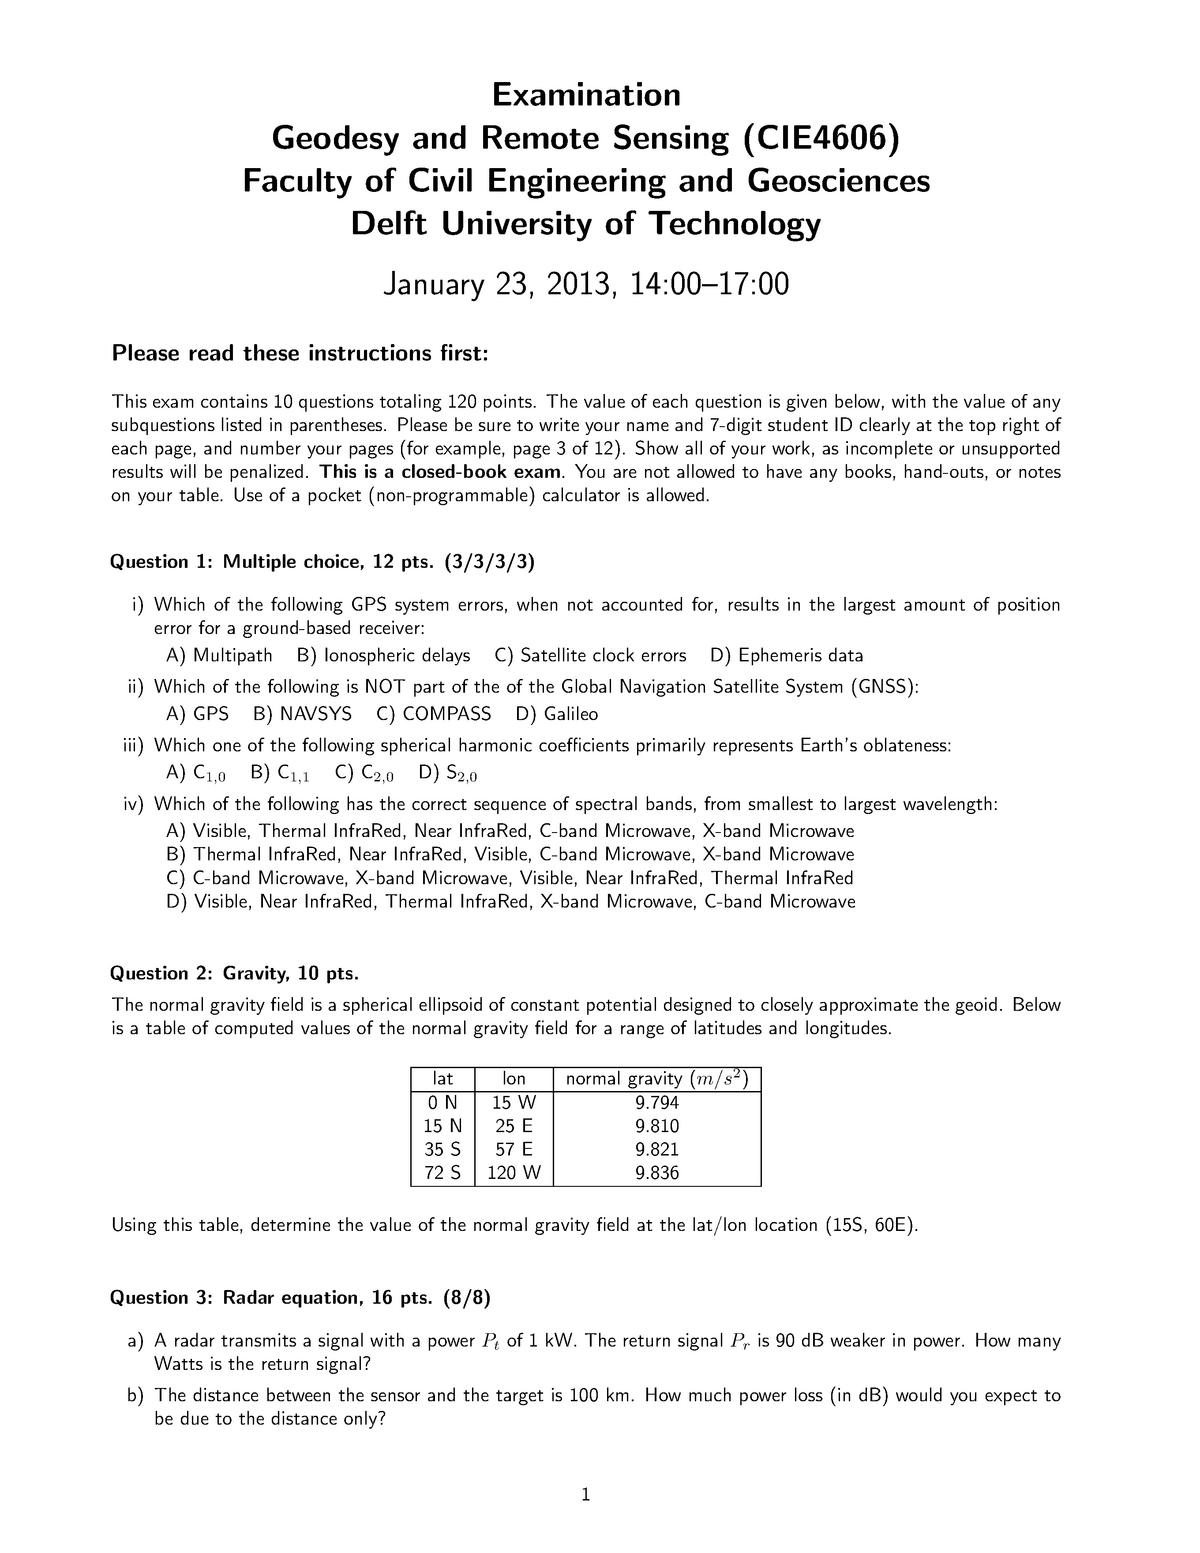 Exam cie4606 2013-01-23 delft - CIE4606: Geodesy and Remote Sensing